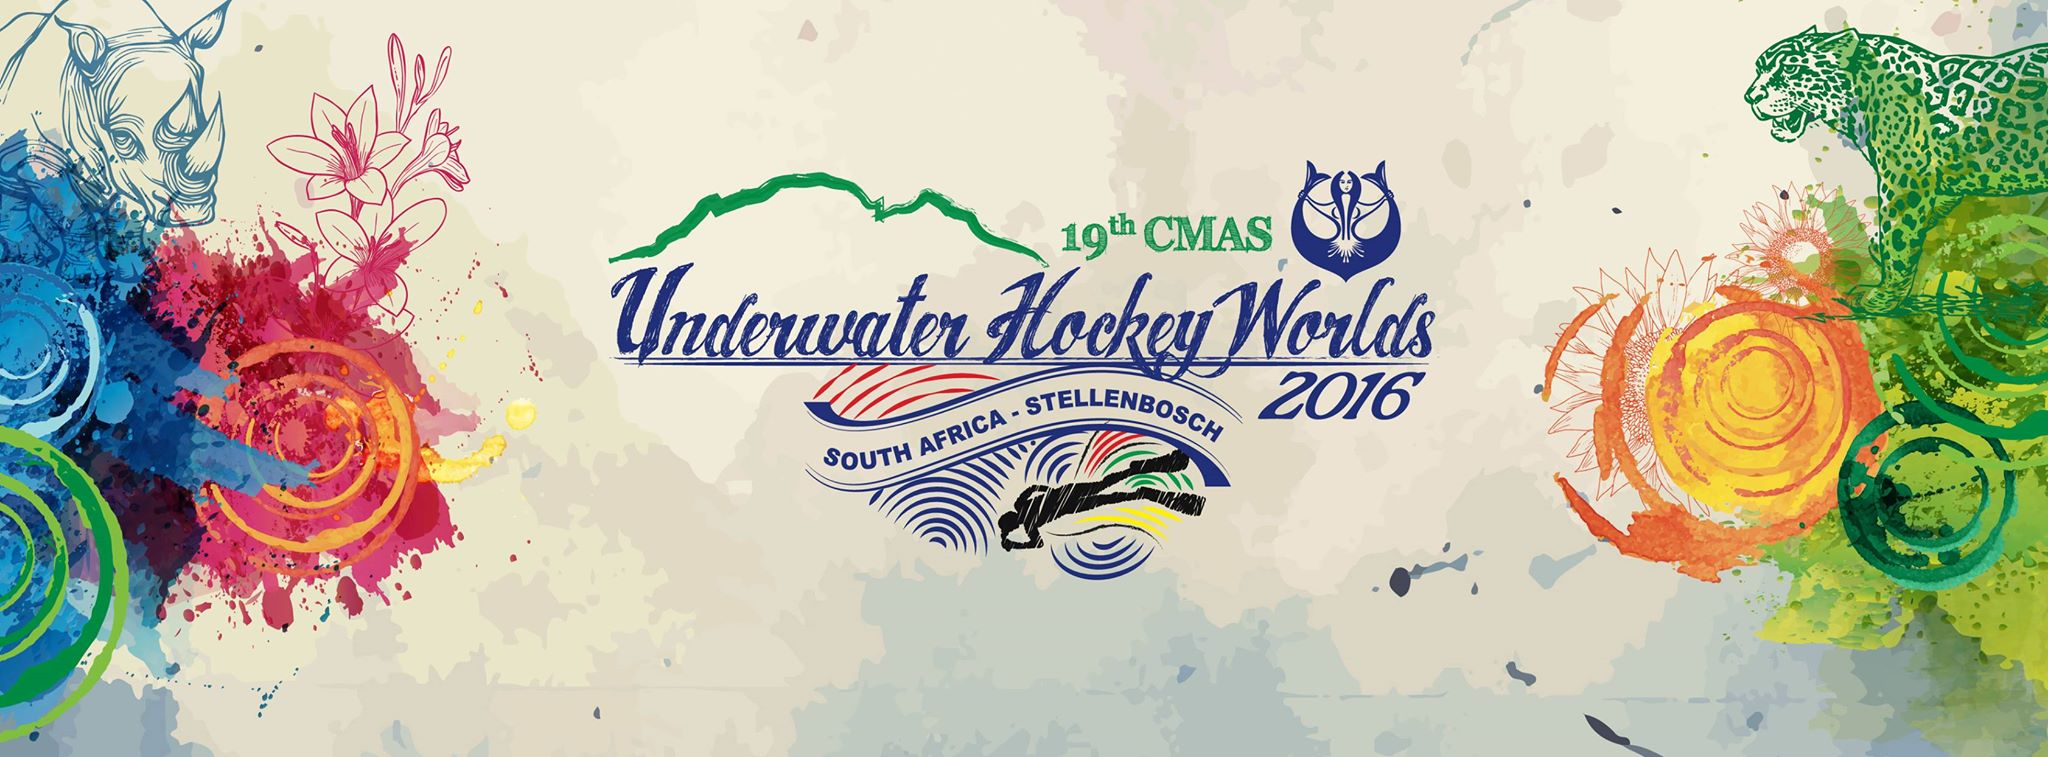 Cartel Mundial Sudafrica Hockey Subacuático